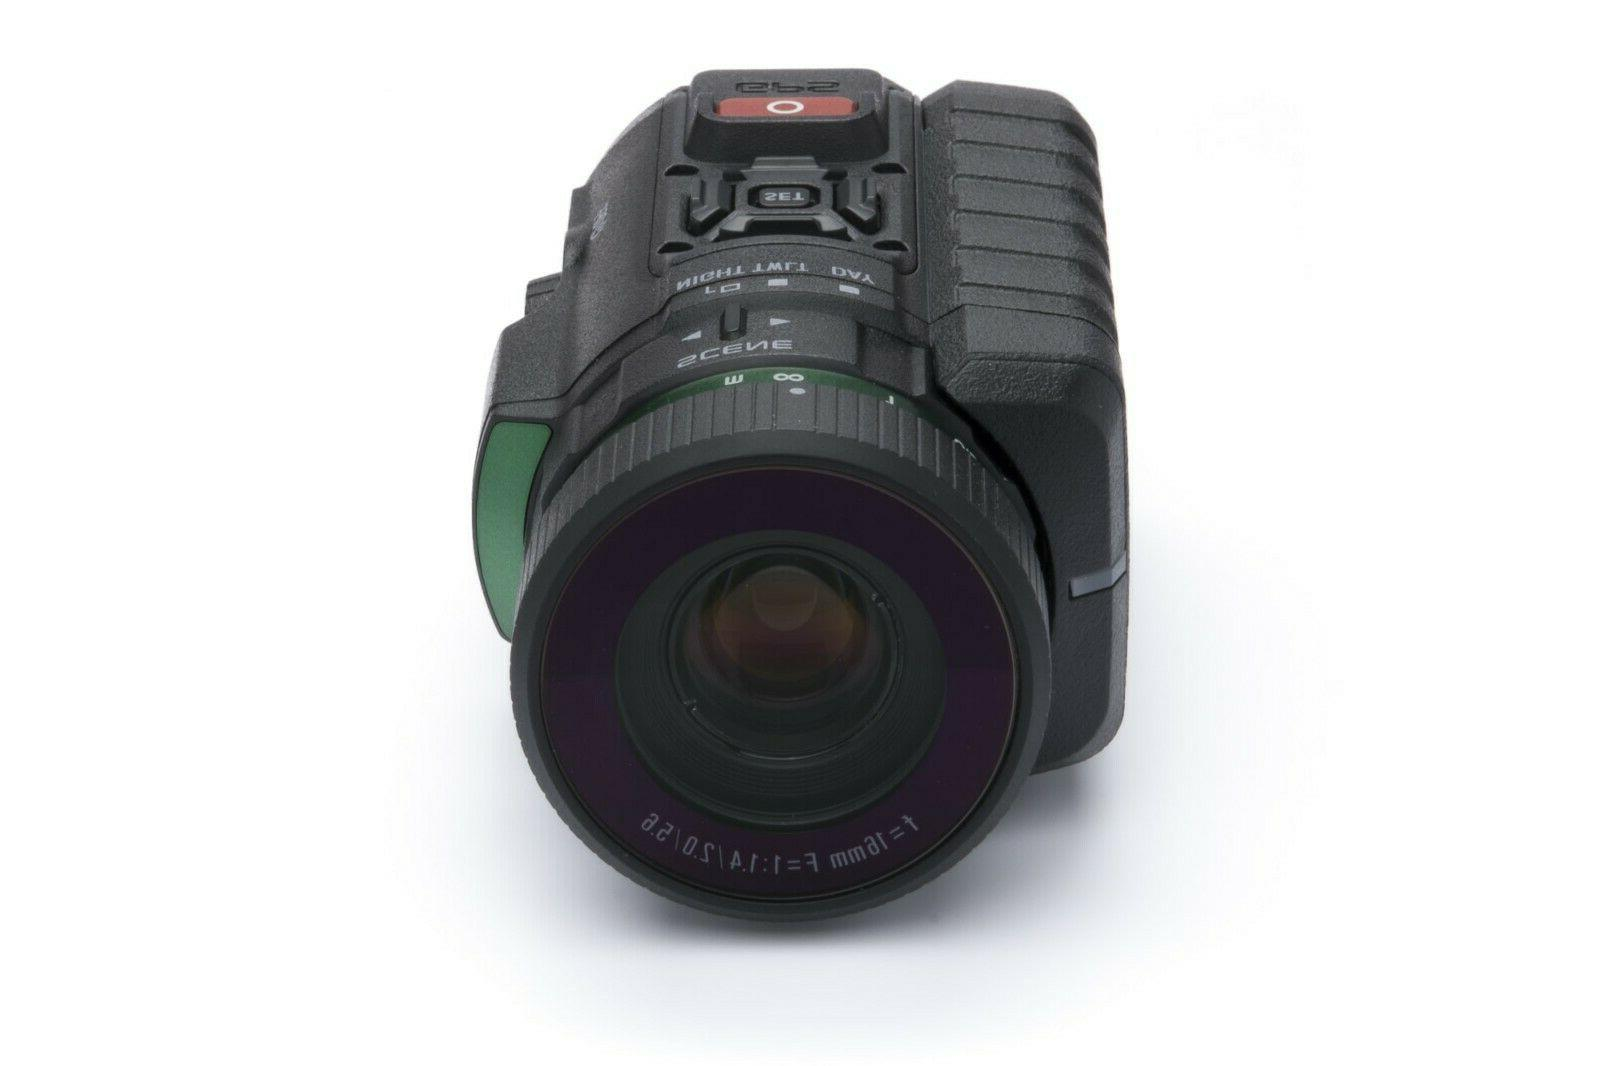 SiOnyx Aurora Vision Action camera use night